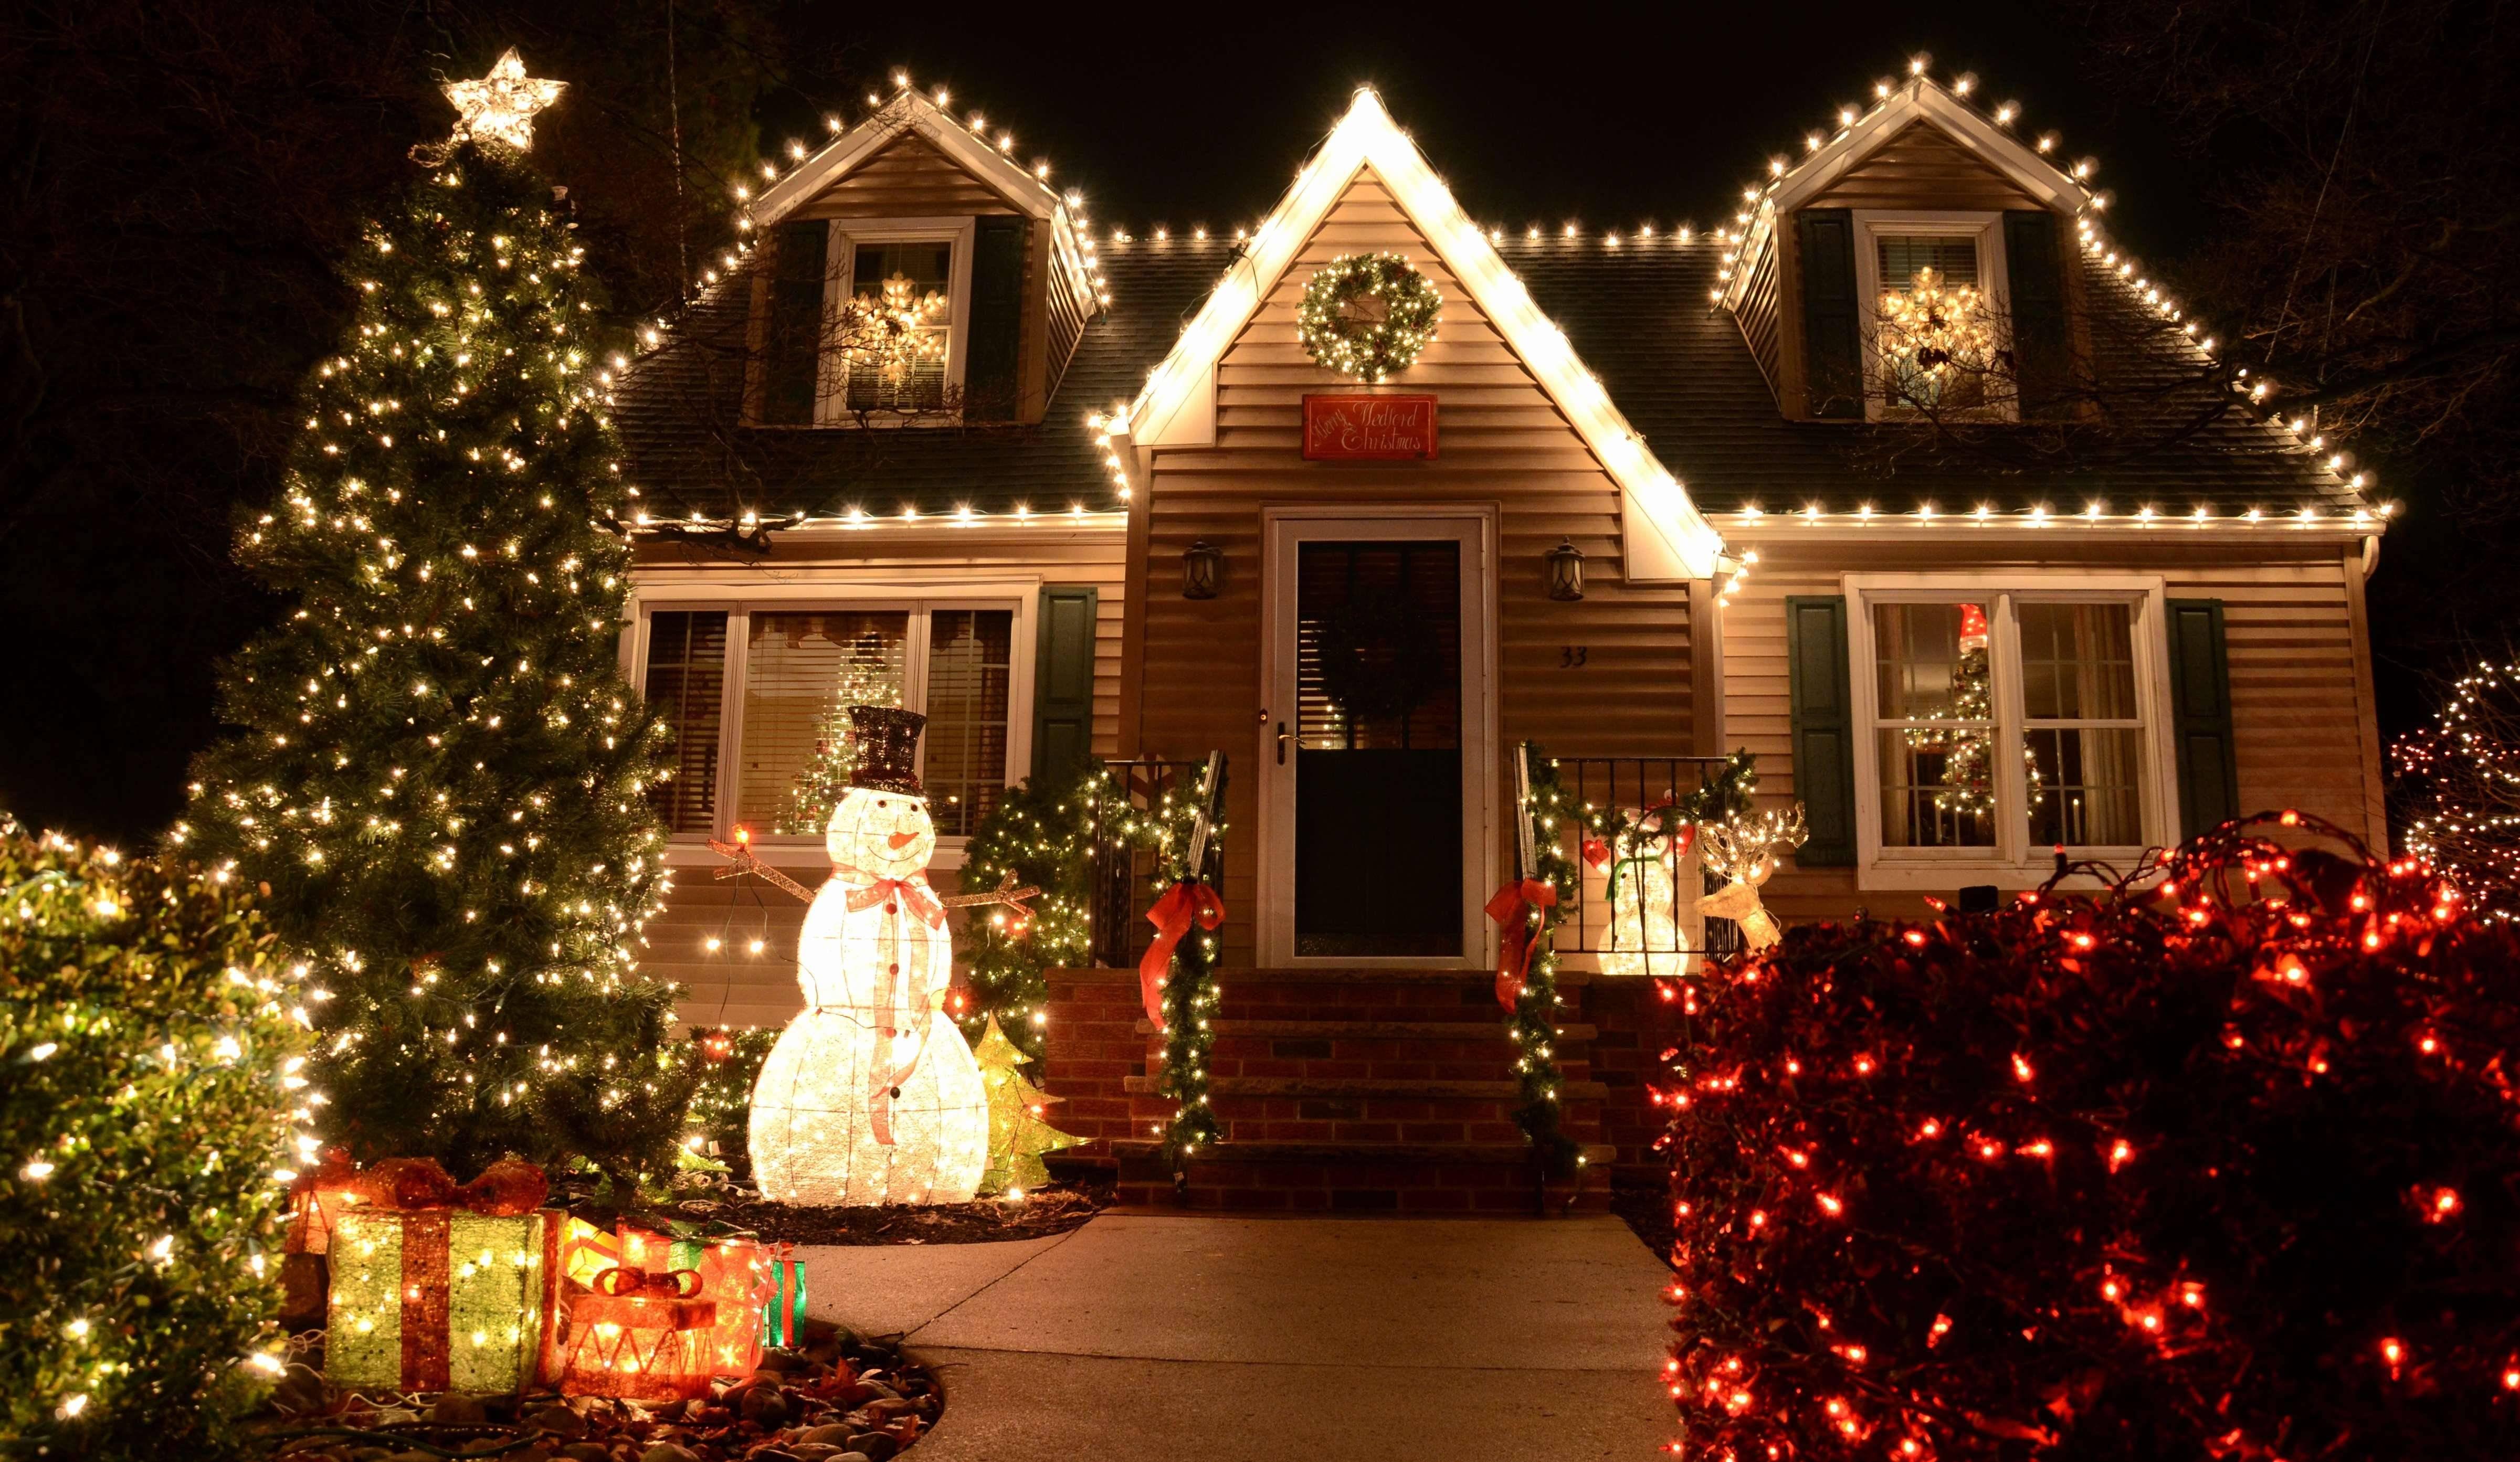 home decorating for christmas inspirational cheap outdoor christmas decoration ideas fresh decor home decor 2017 of home decorating for christmas